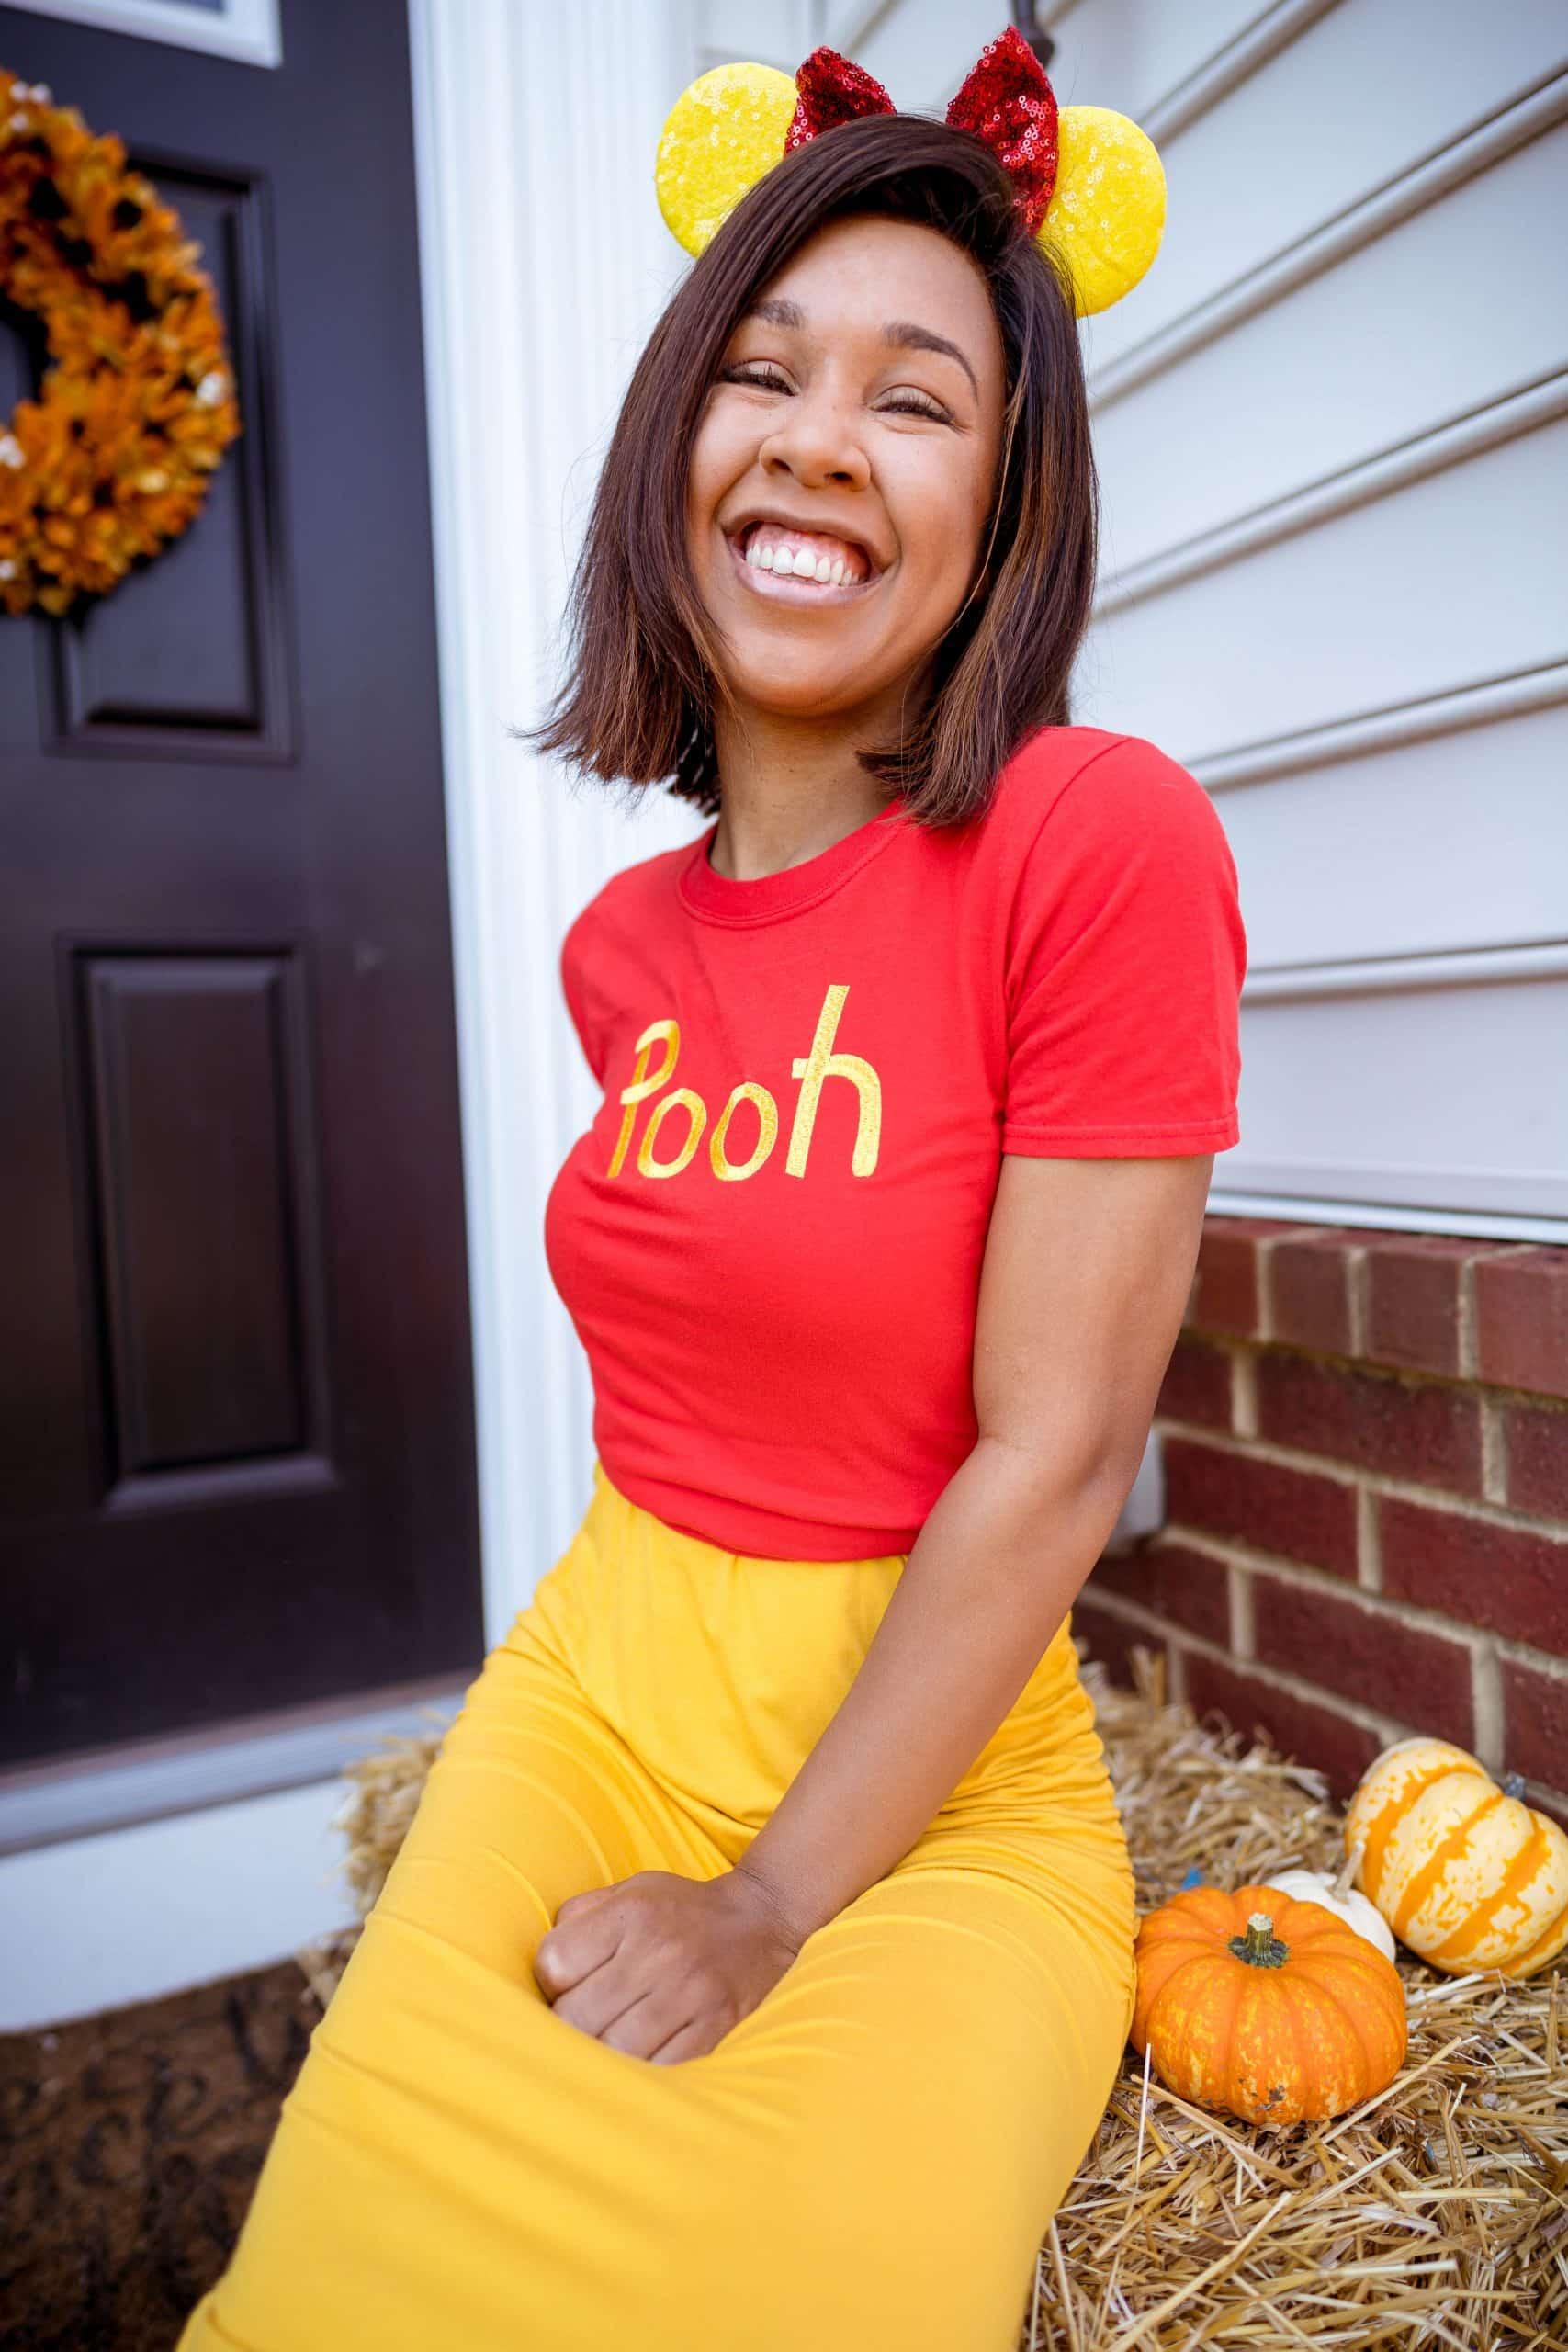 livinglesh winnie the pooh halloween costume